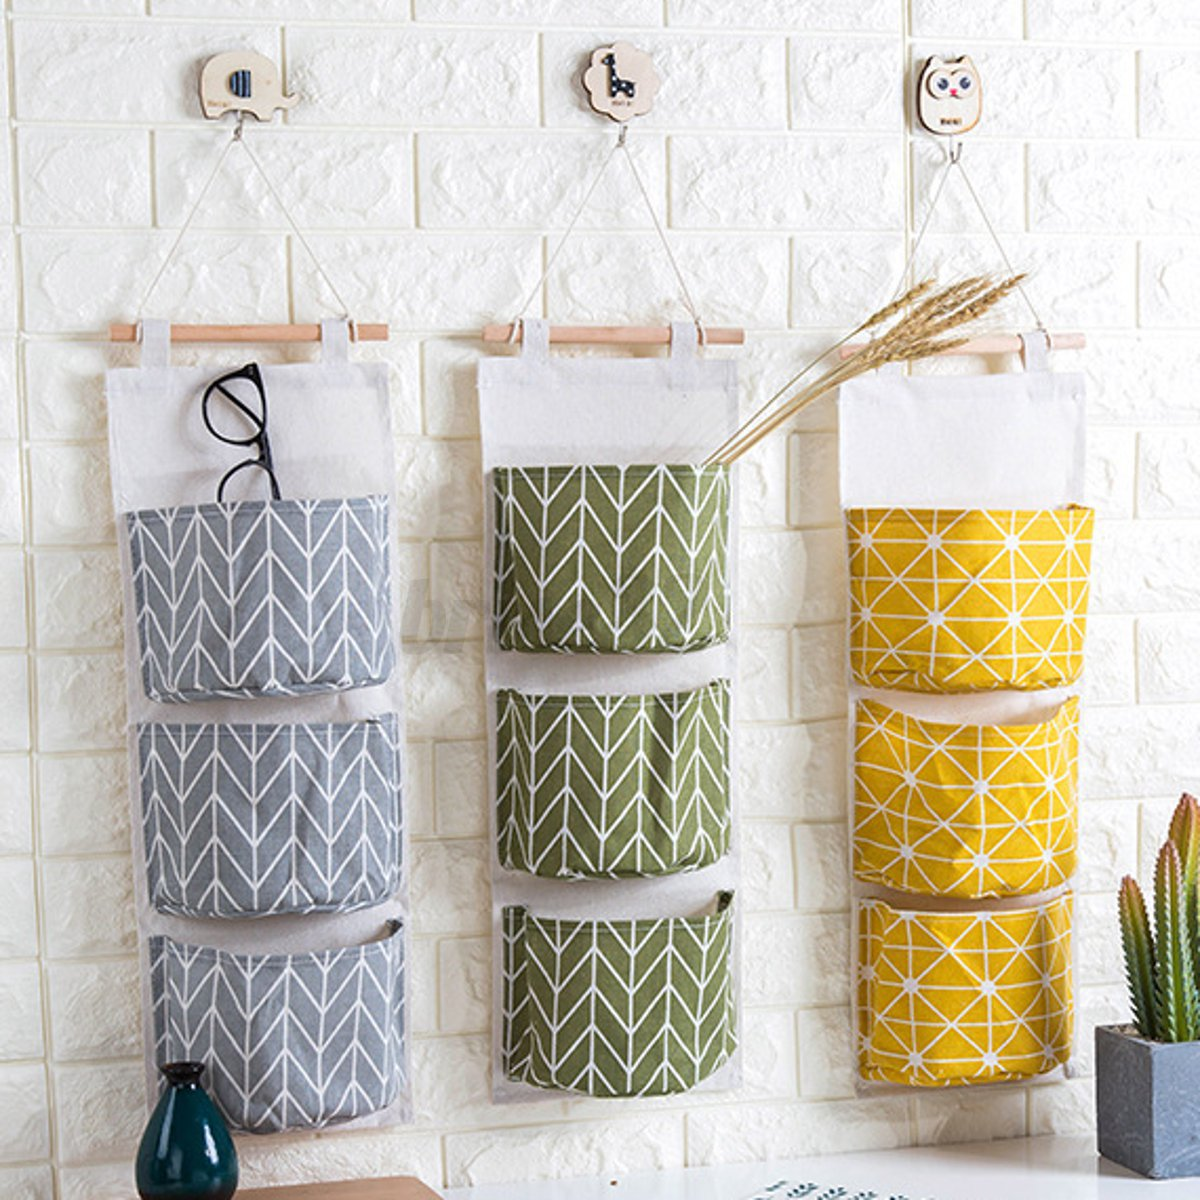 3 Grids Wall Hanging Storage Bag Organizer Toys